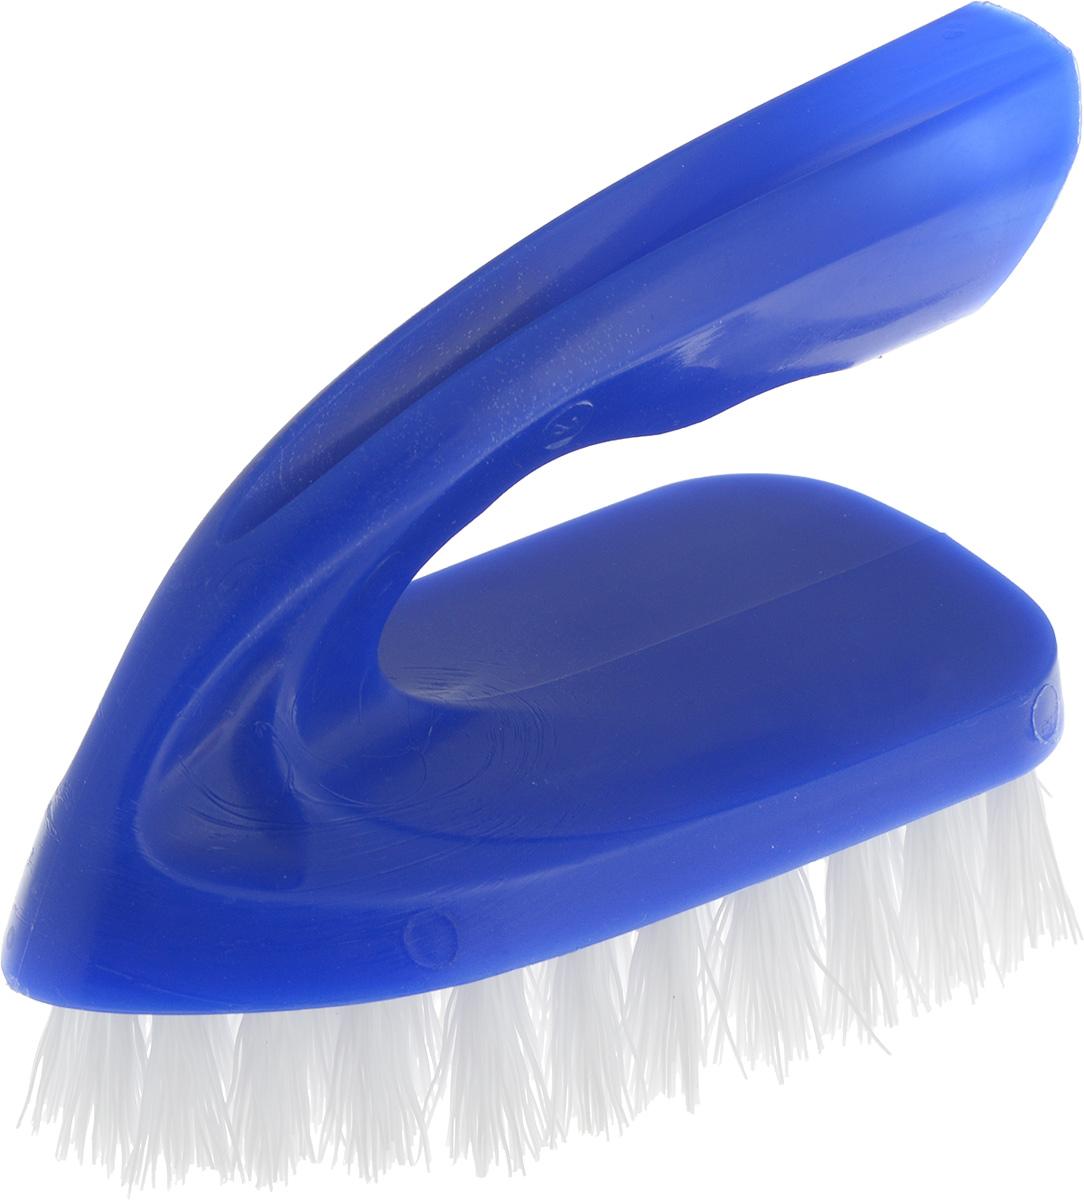 "Щетка для одежды Svip ""Утюжок Миди. Классика"", цвет: синий, белый, 10 х 6 х 8,5 см SV3112СН"